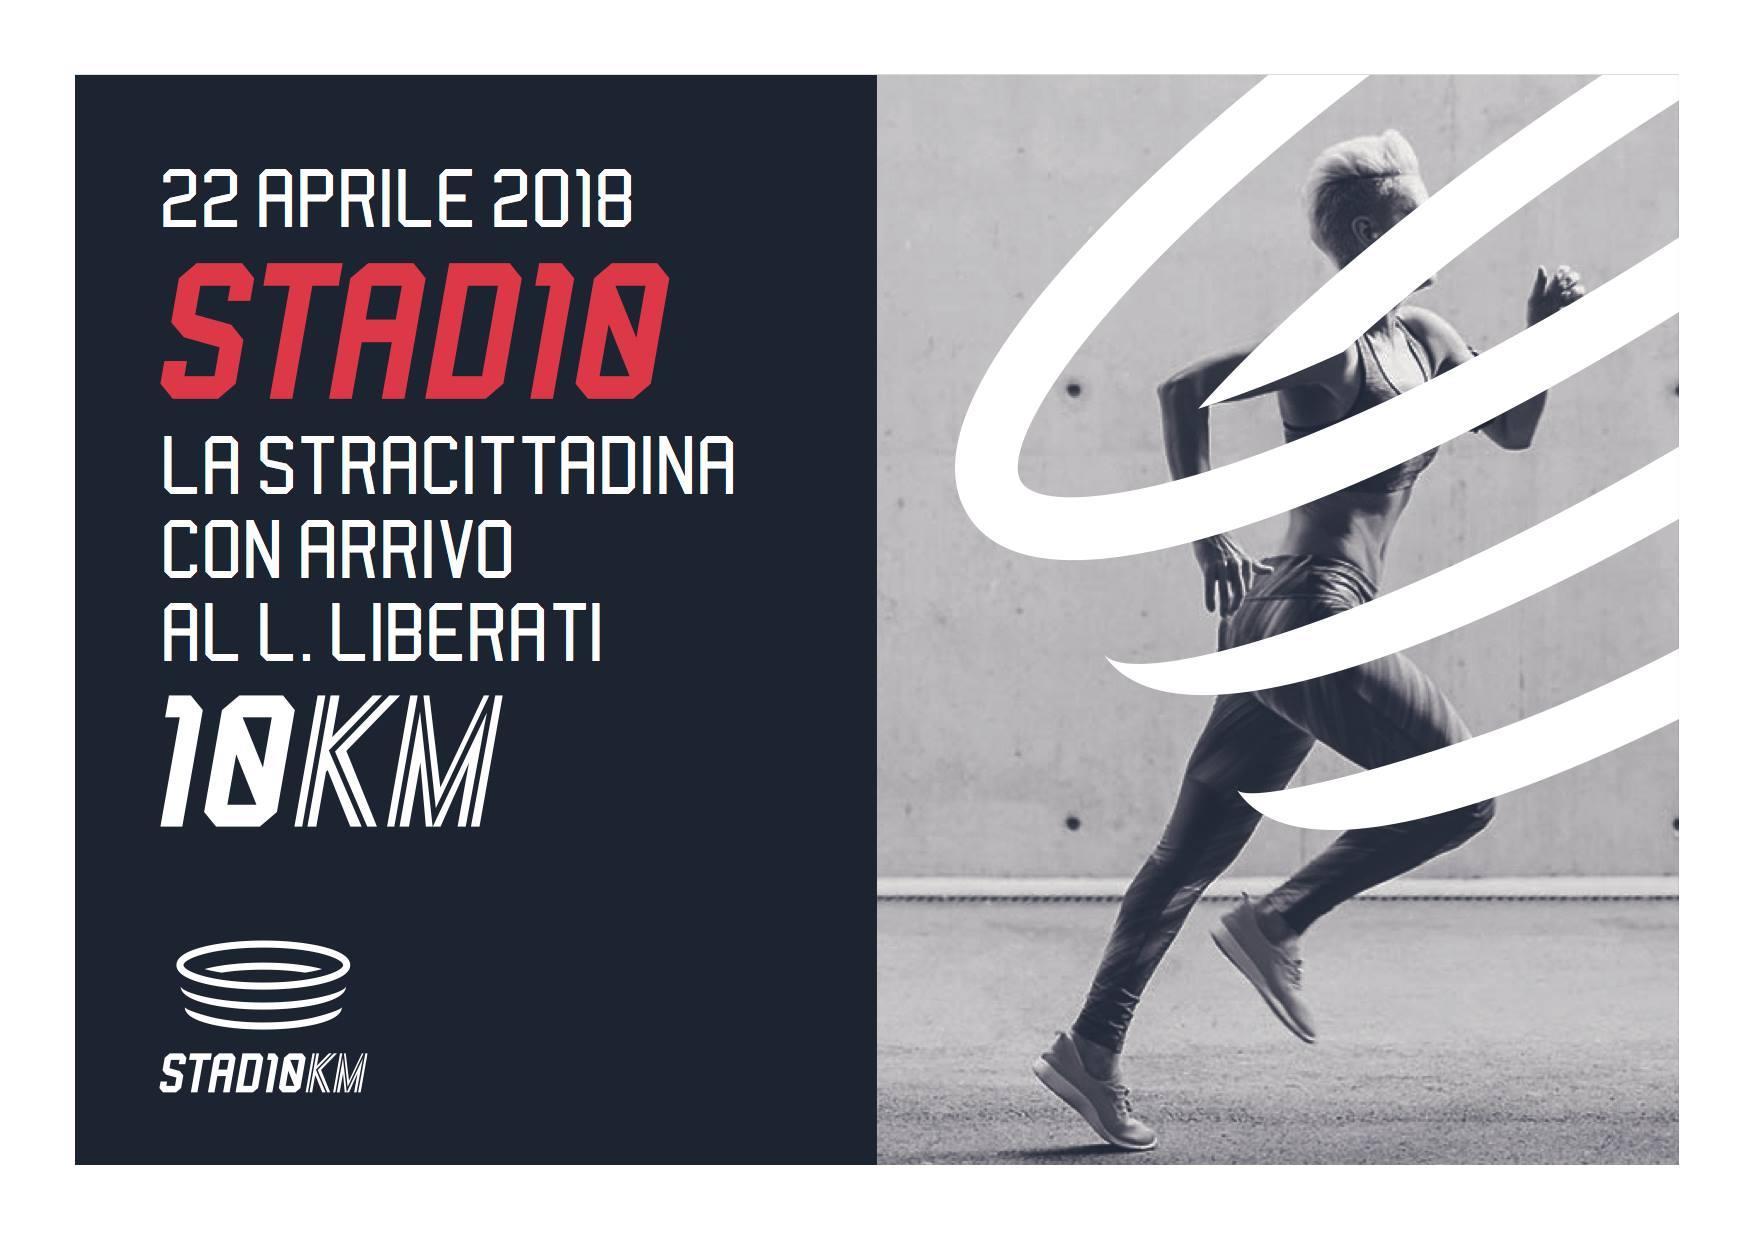 STAD10 by Ternana Marathon